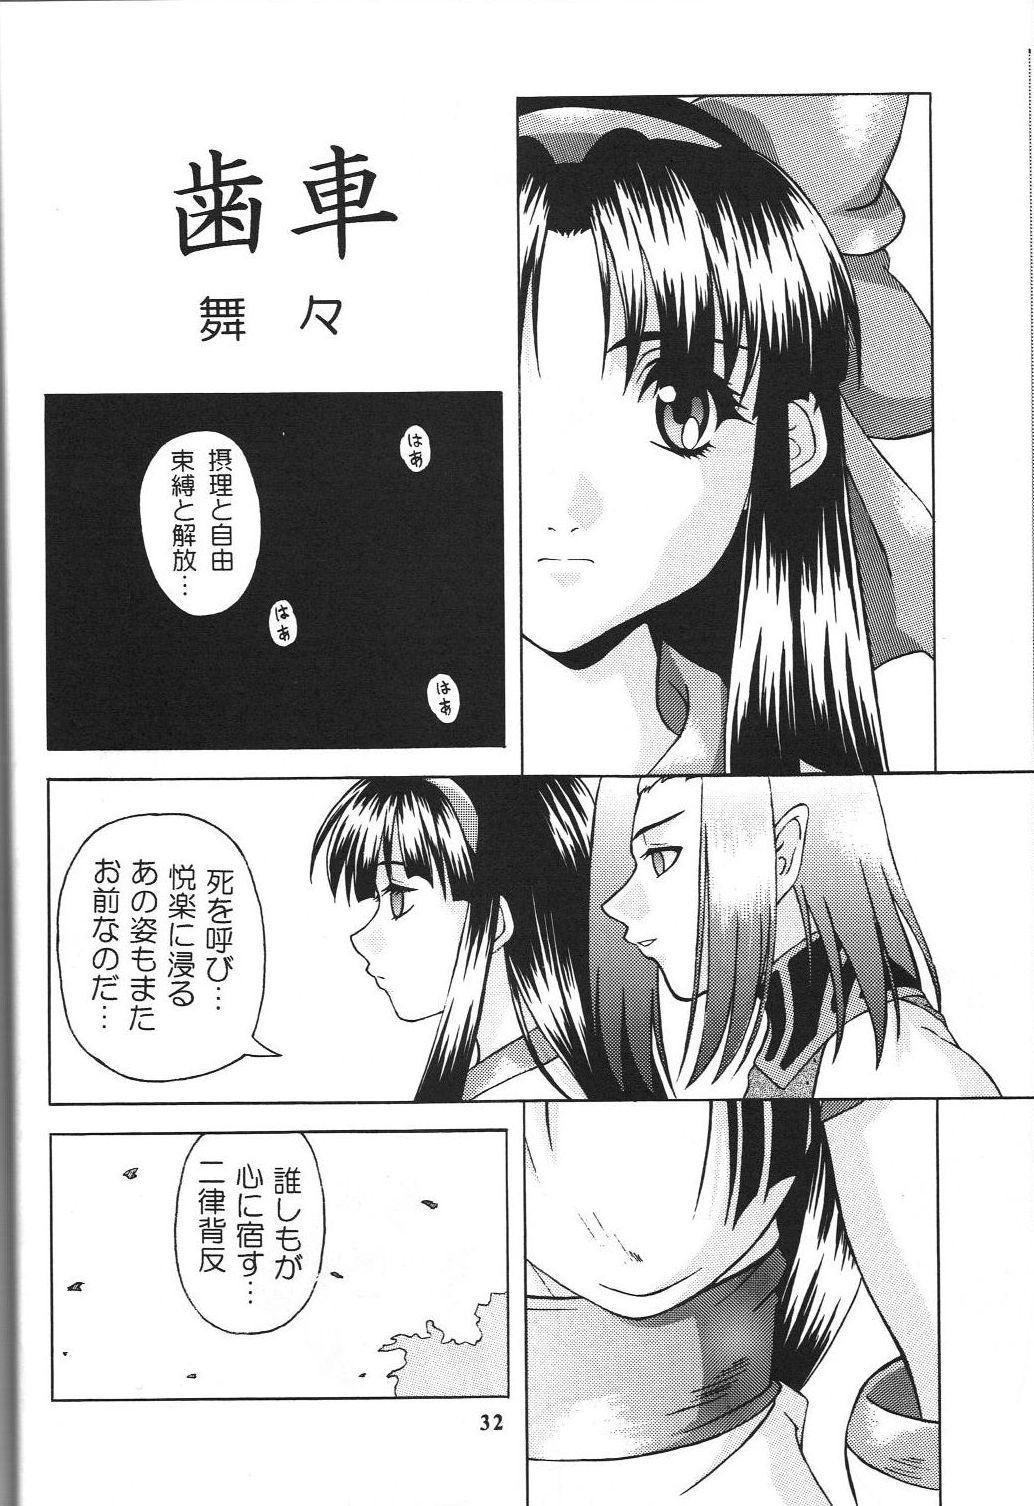 (C56) [Tsurikichi Doumei (Various)] Sengoku Rock - Nan Demo-R (Various) 32